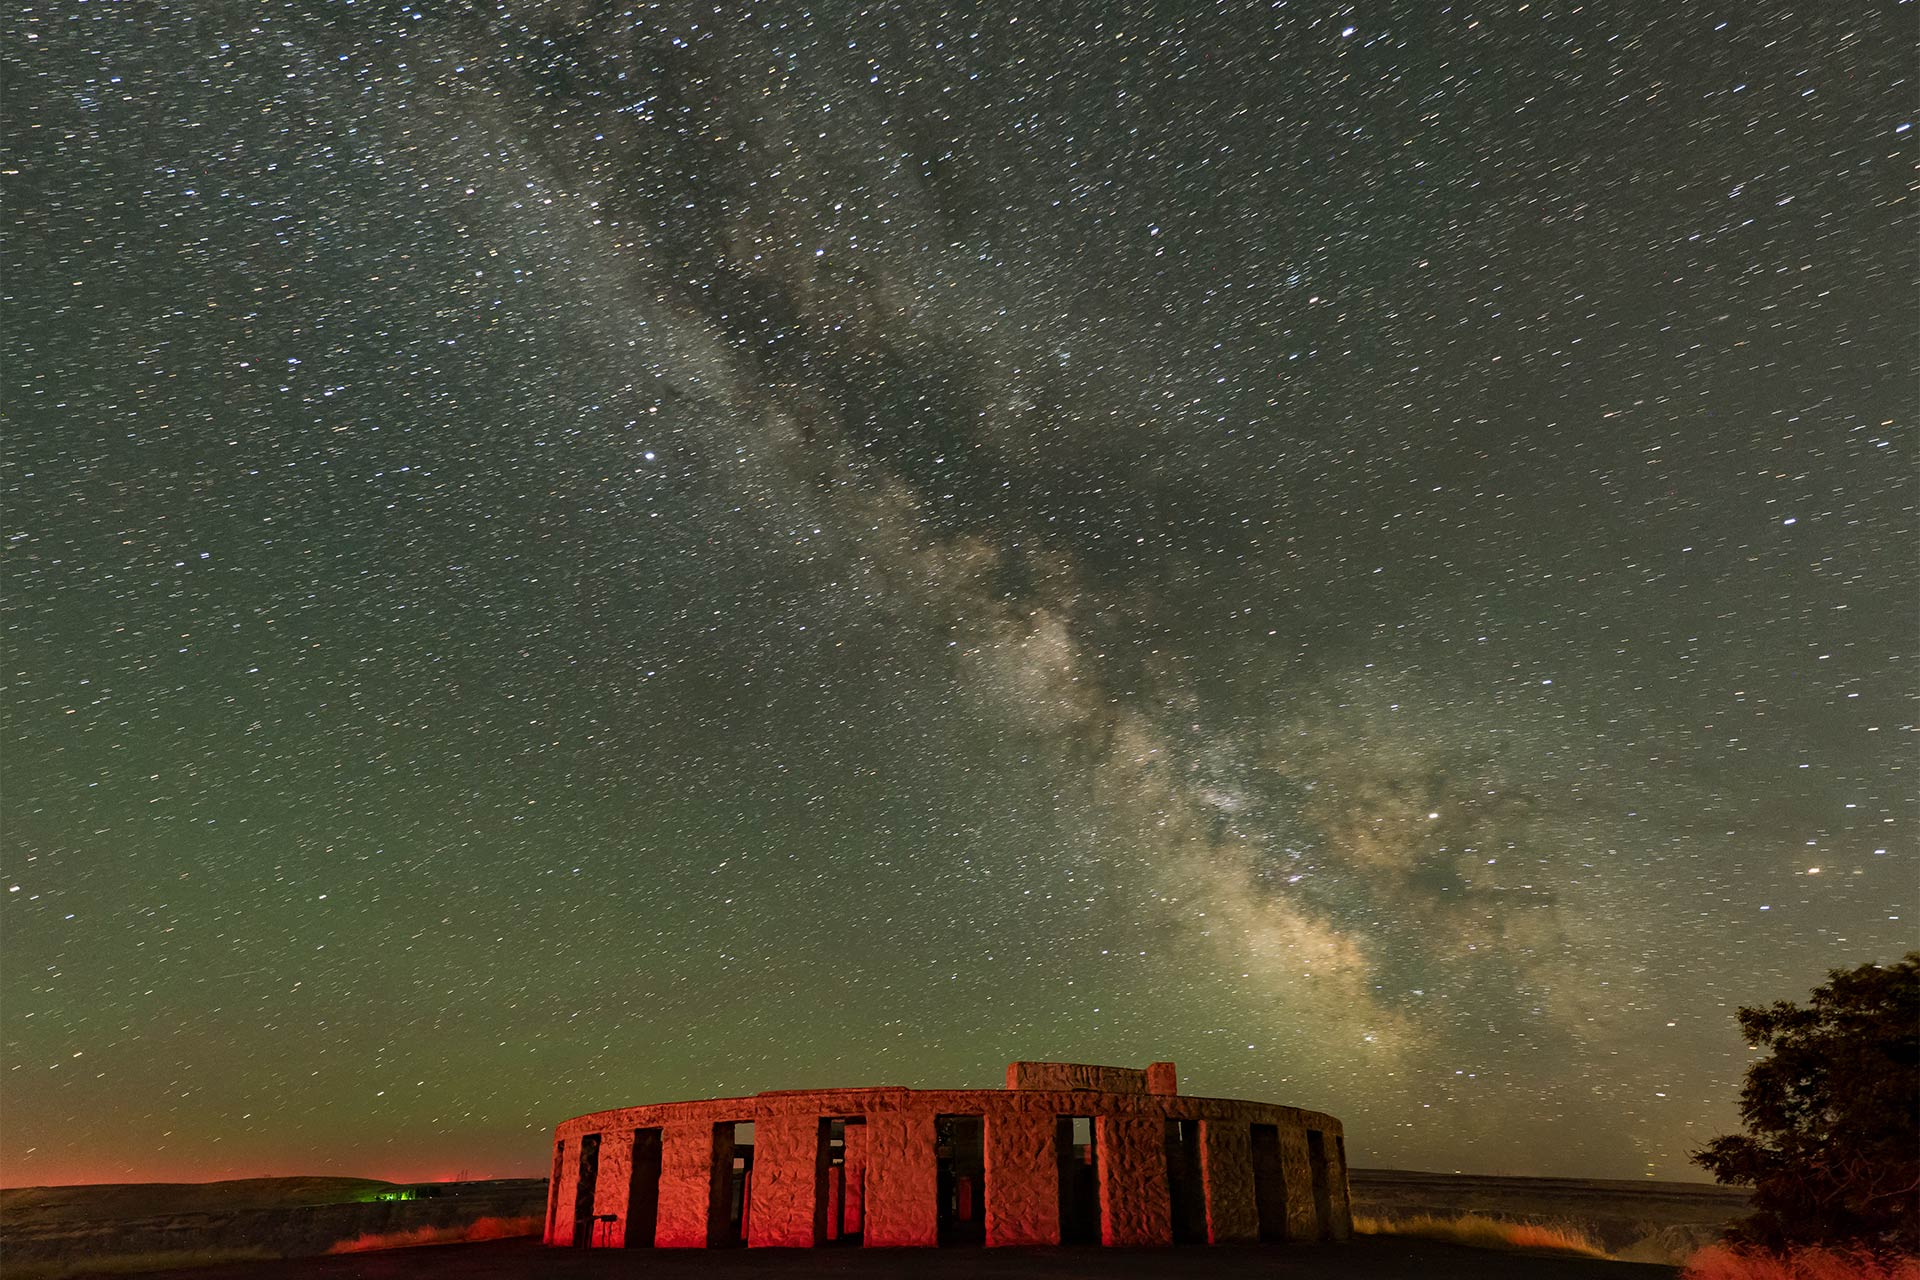 milky-way-night-sky-photography-stone-henge-washington